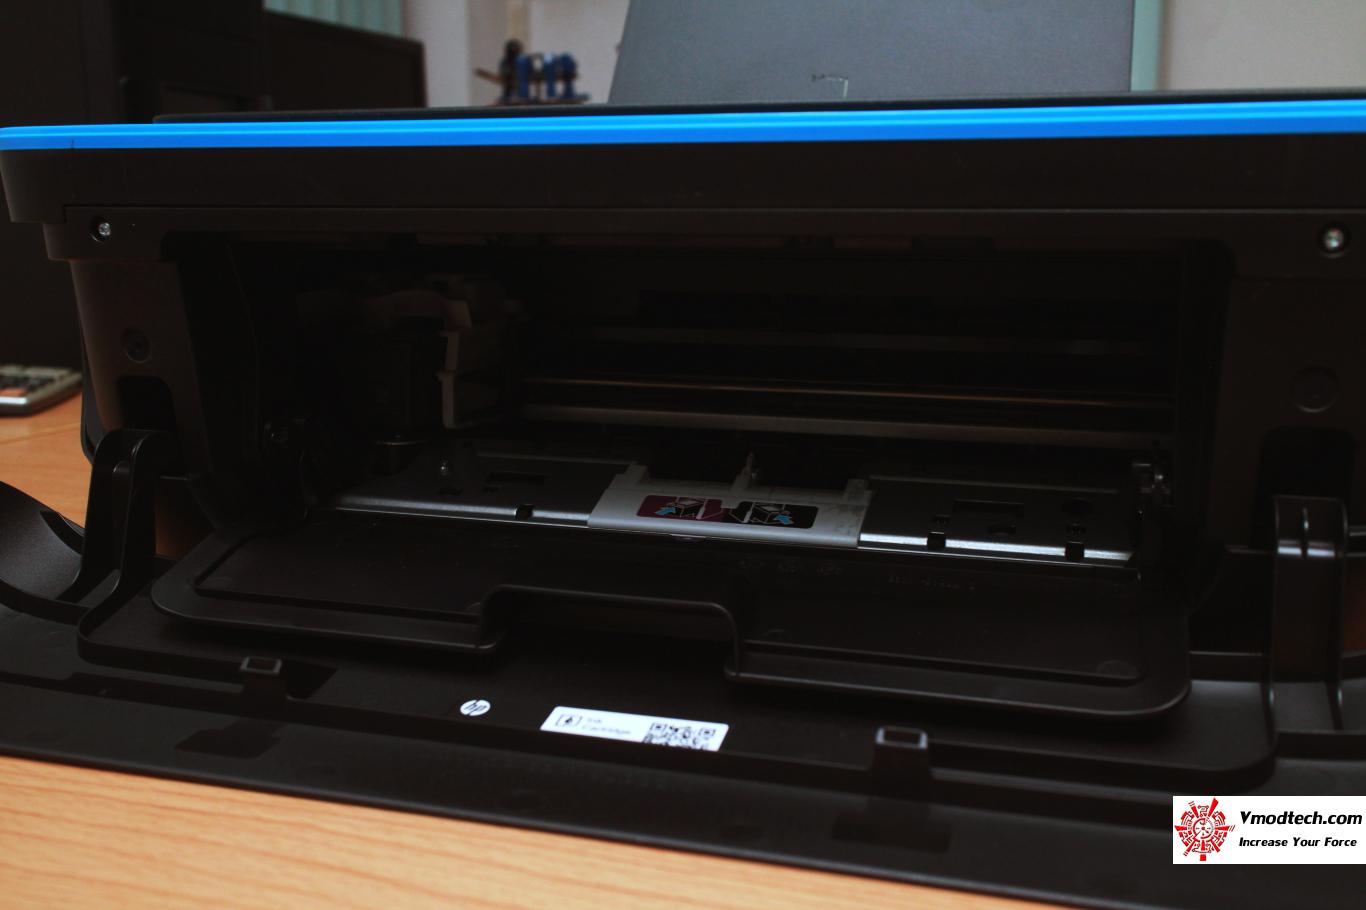 img 6944 HP Deskjet Ink Advantage Ultra 4729 All in One Printer